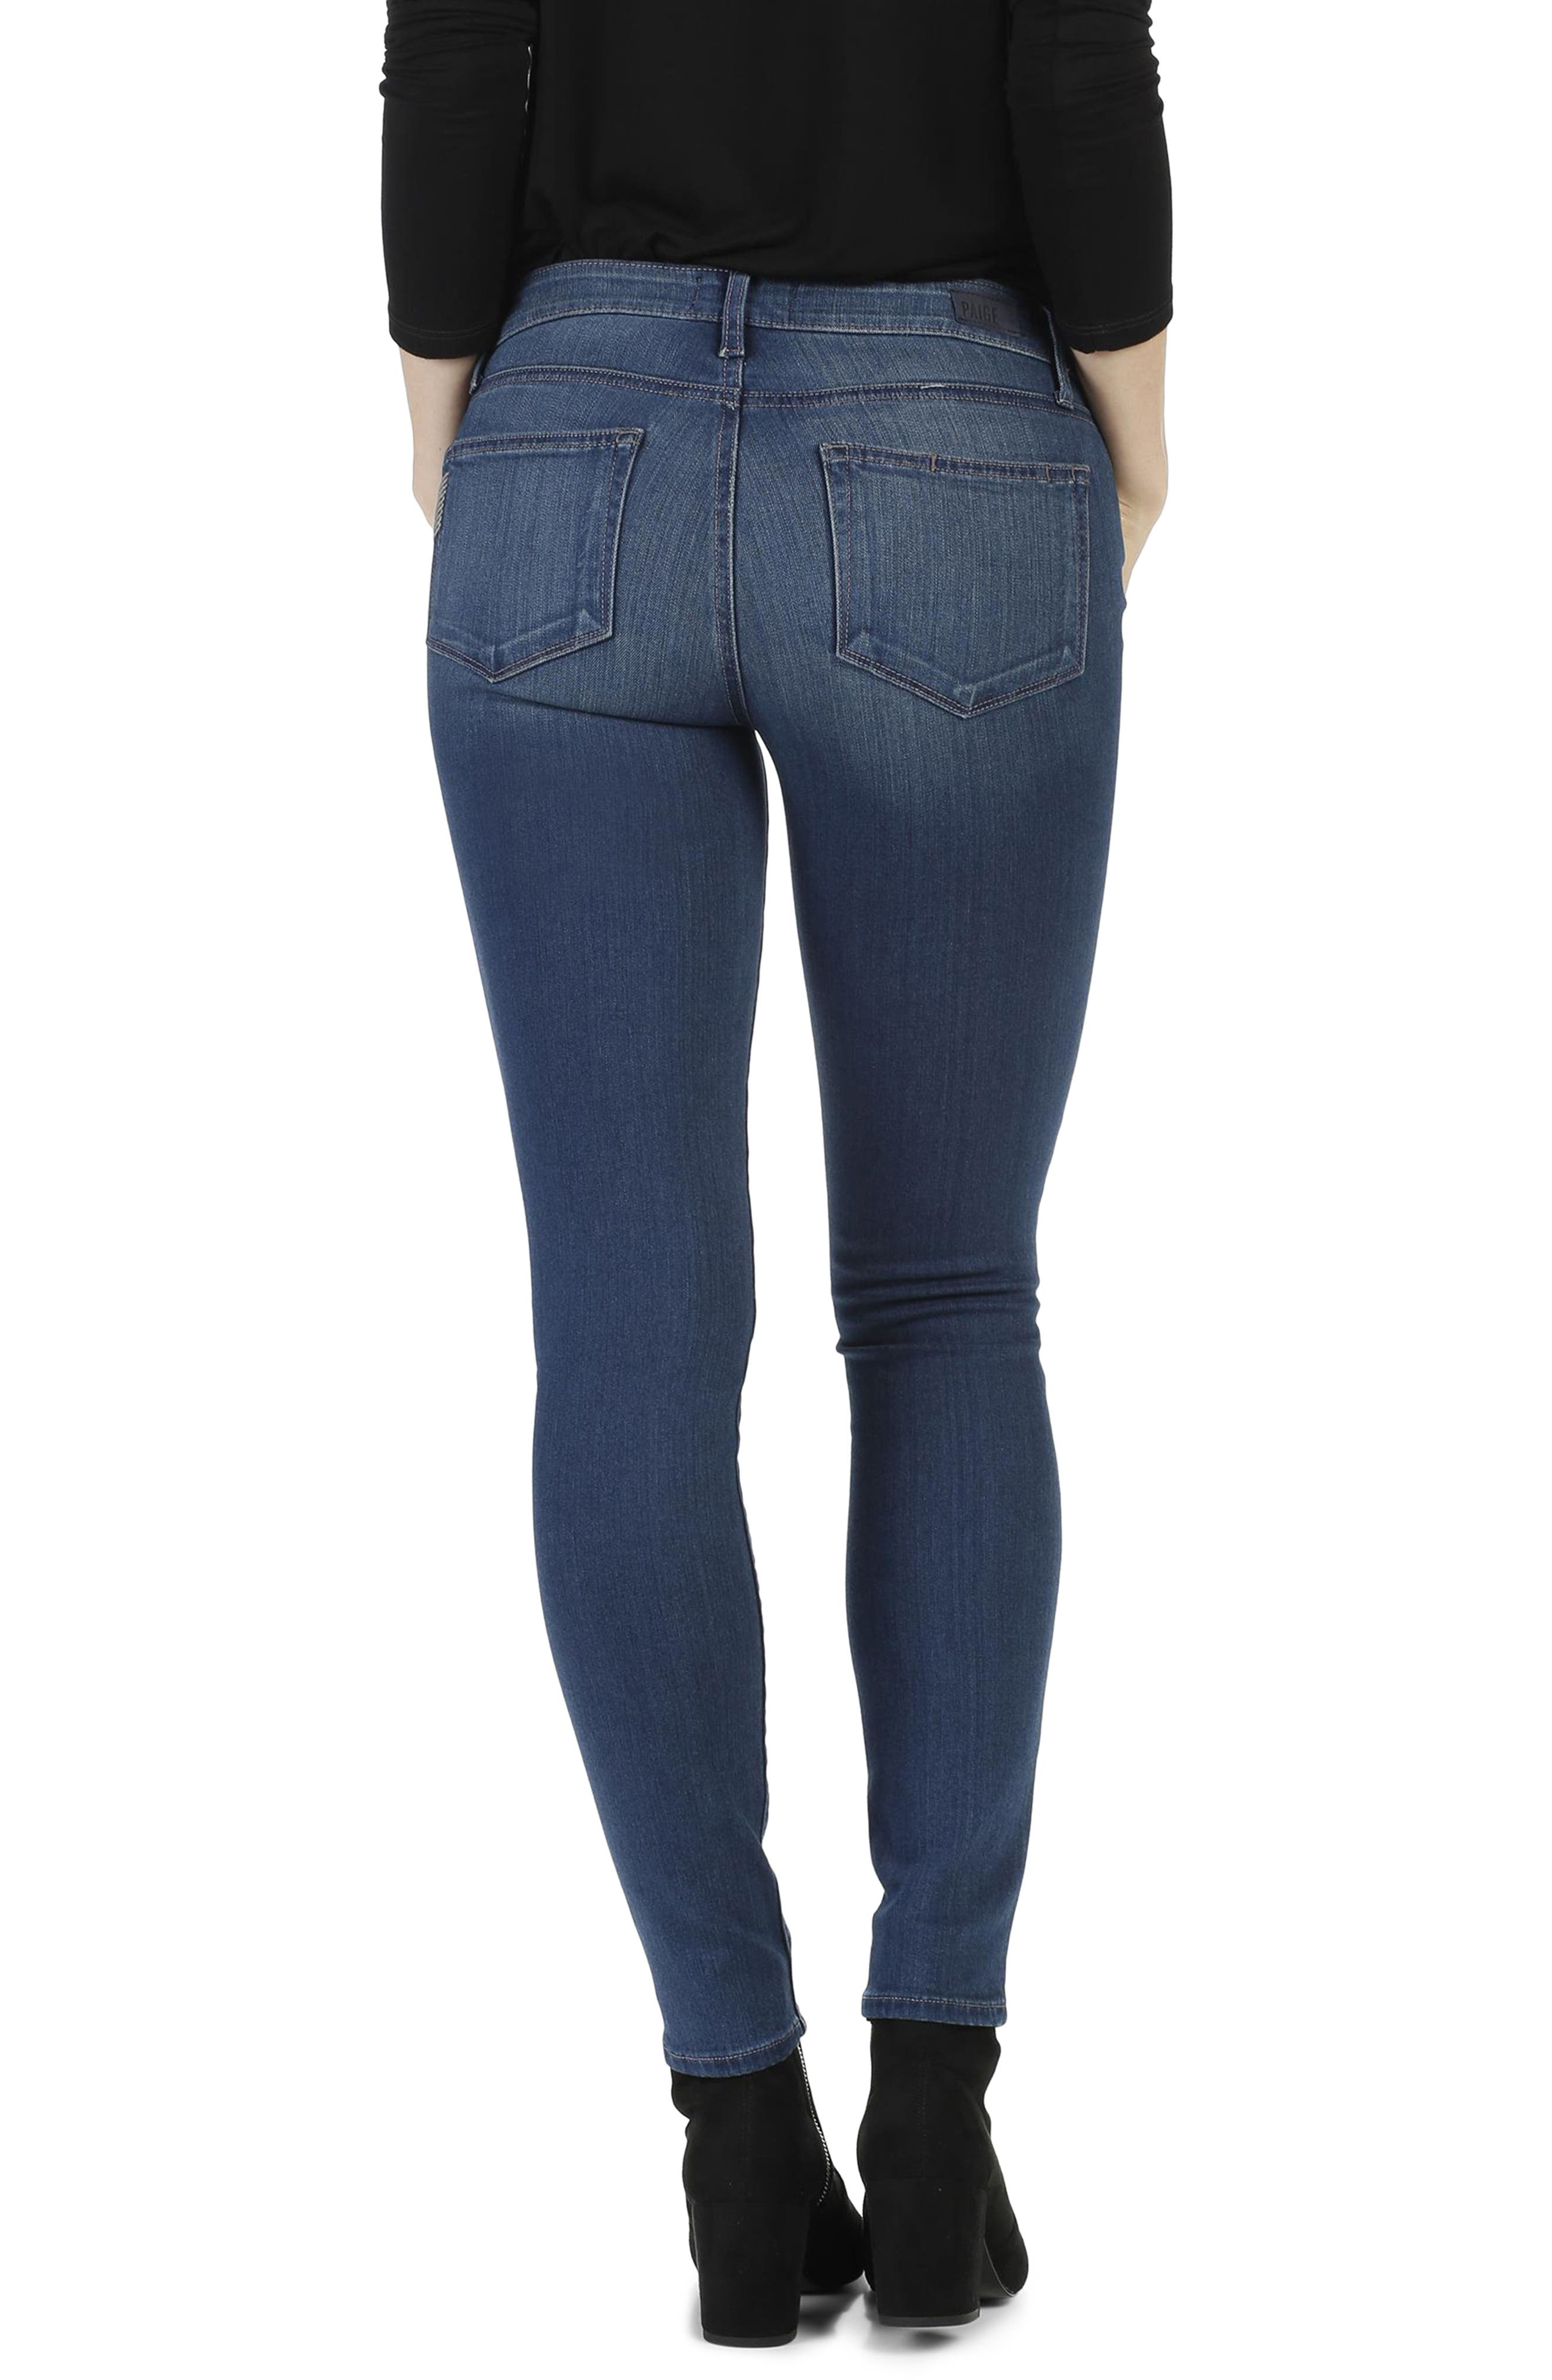 Transcend - Verdugo Ultra Skinny Jeans,                             Alternate thumbnail 3, color,                             400